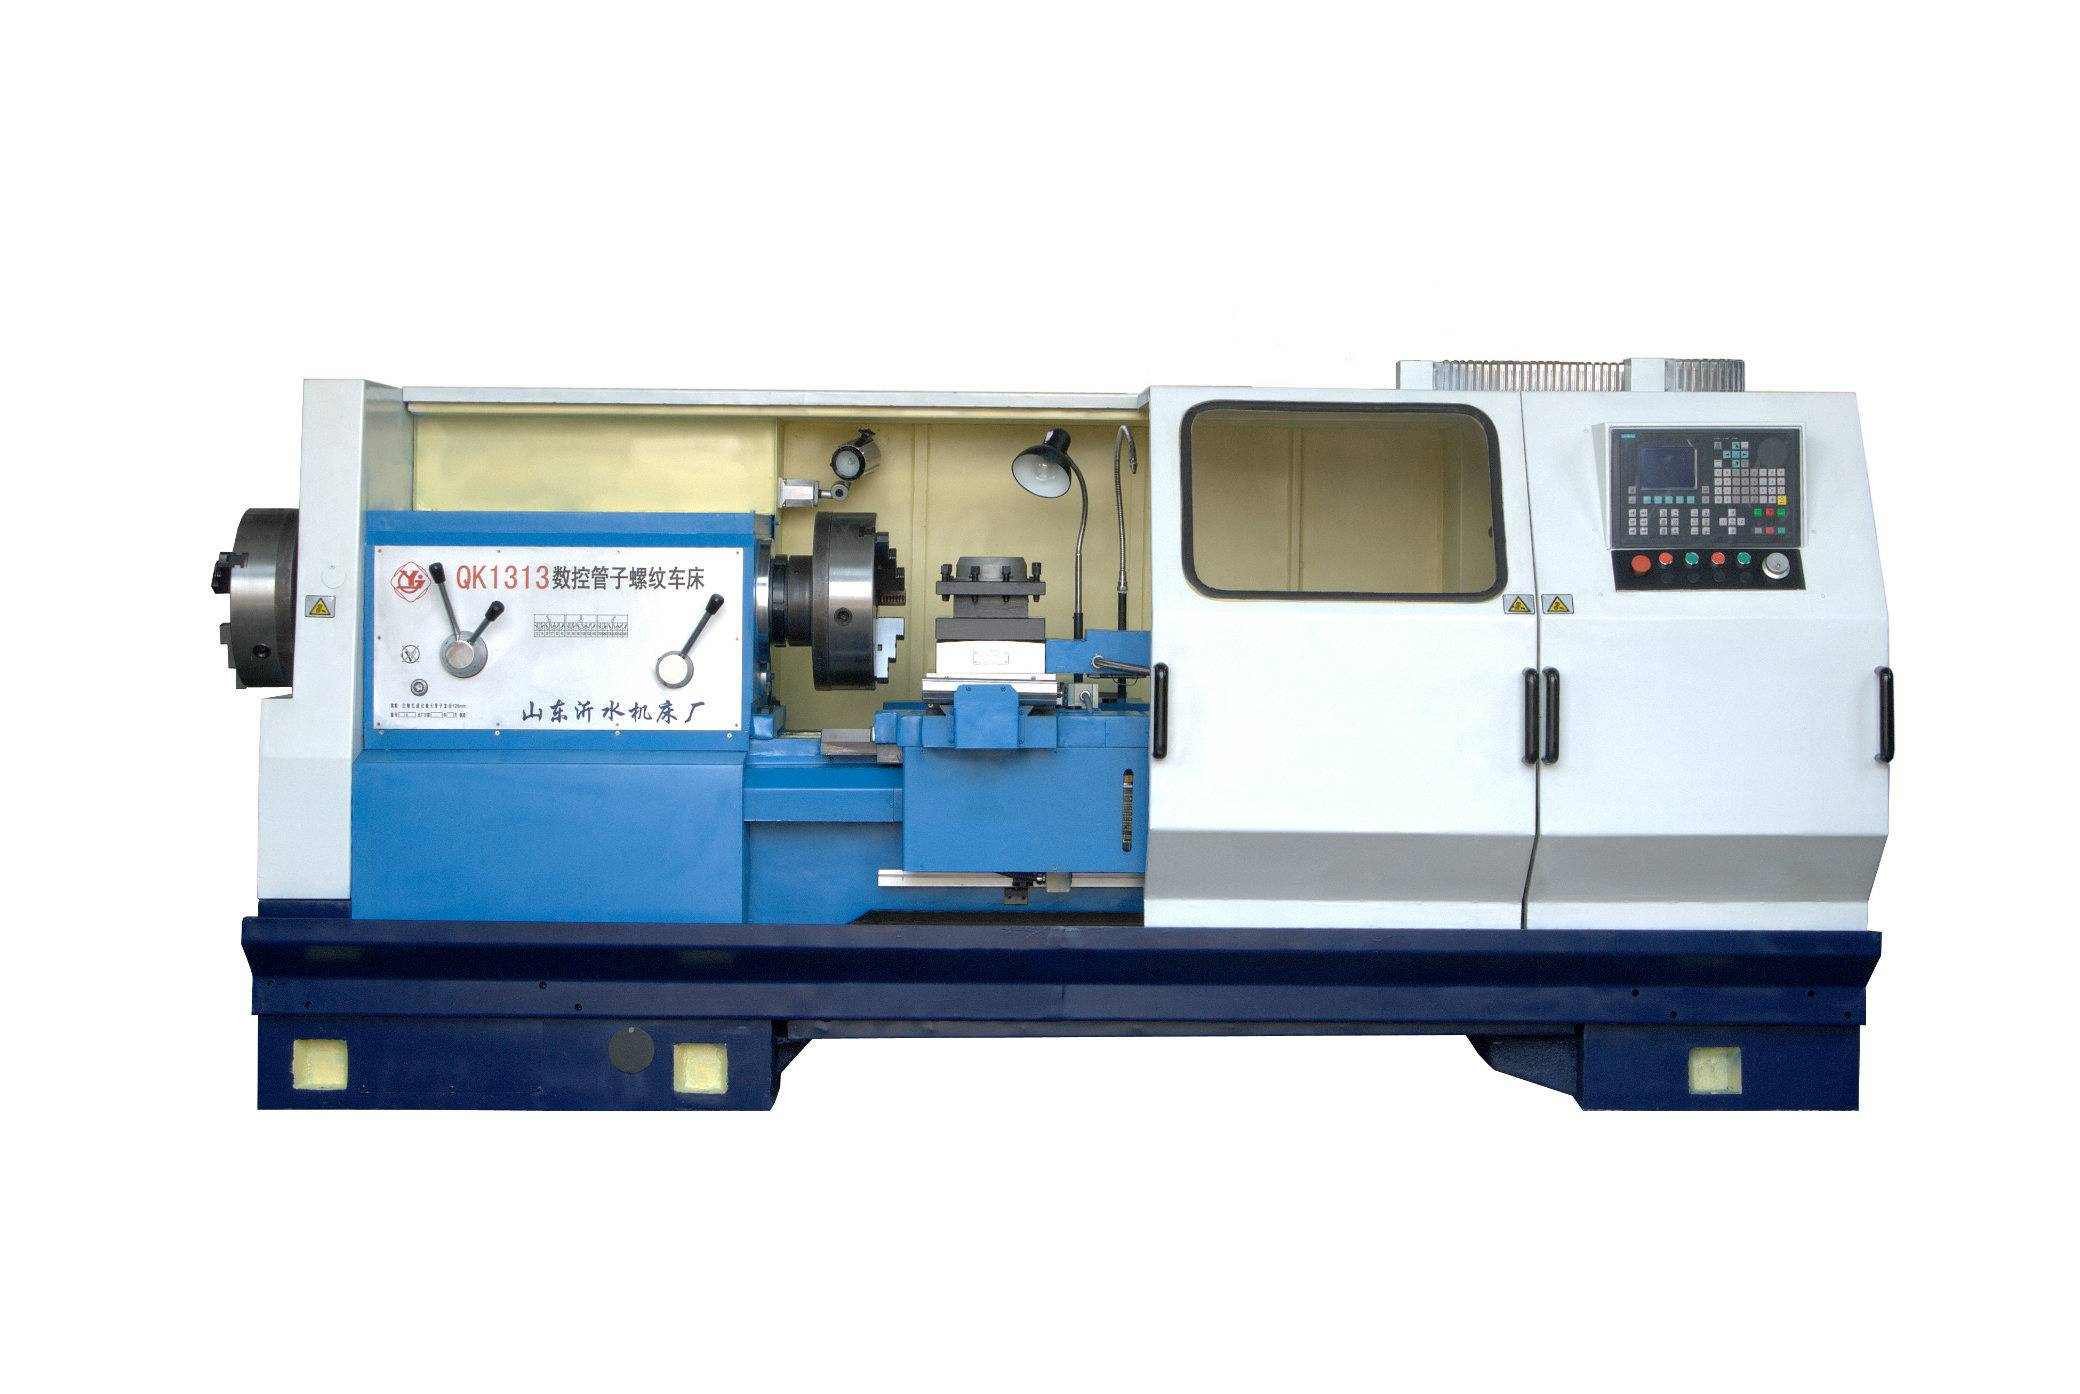 QK1319 CNC Pipe Threading Lathe Machine